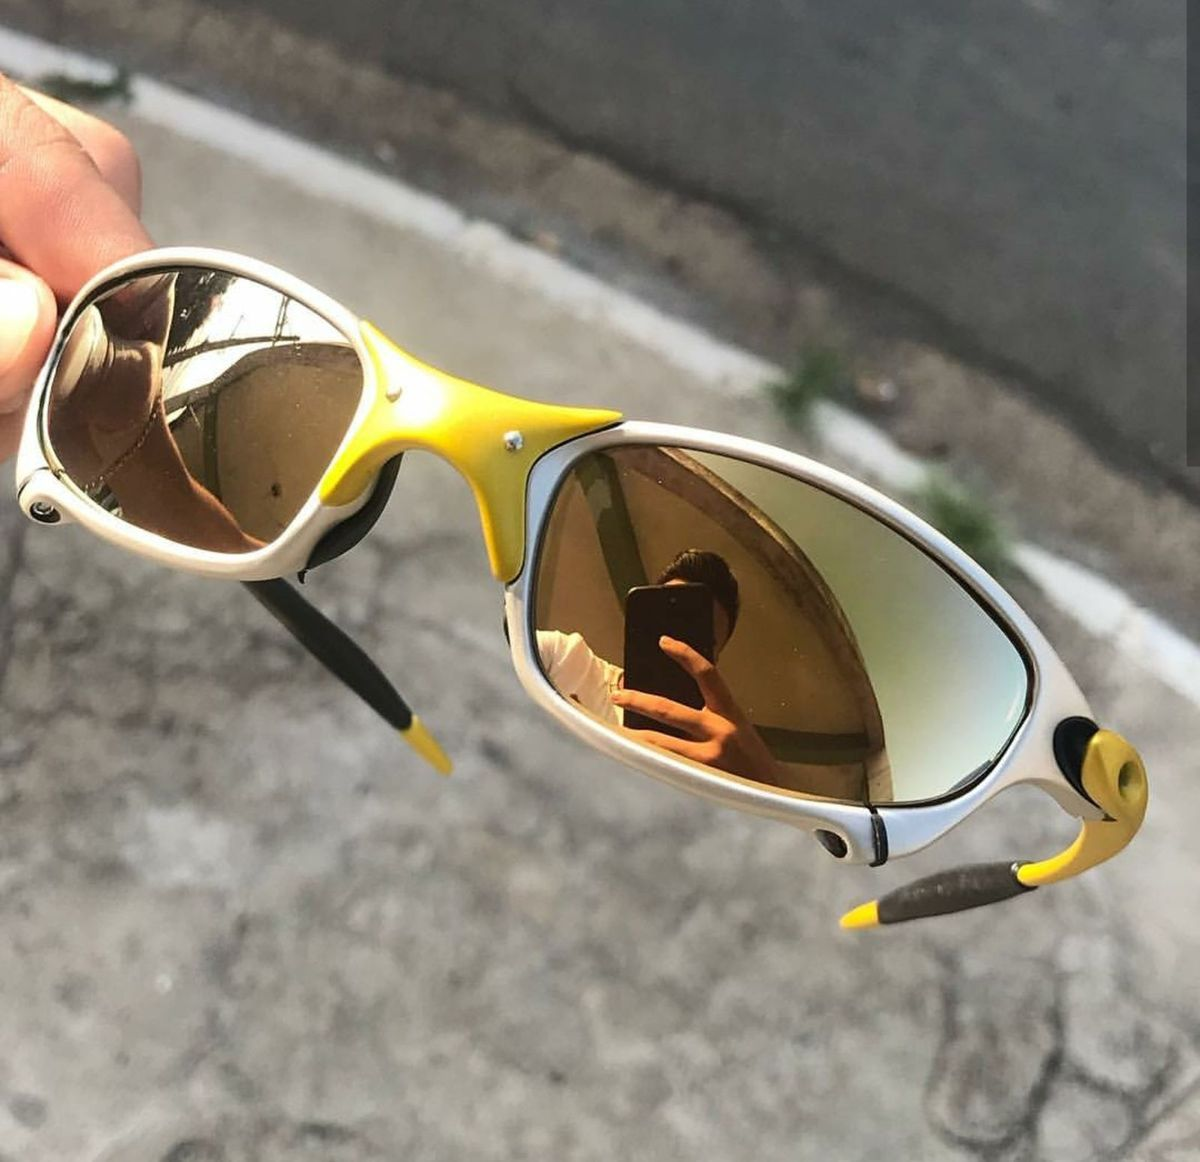 oculos oakley 24k masculino - óculos oakley.  Czm6ly9wag90b3muzw5qb2vplmnvbs5ici9wcm9kdwn0cy82ntmzotkwlzaznwjlnjcyzjk0ntnhyjjhzjjjodvjytnlzjvjzwmylmpwzw 6d6843b2db